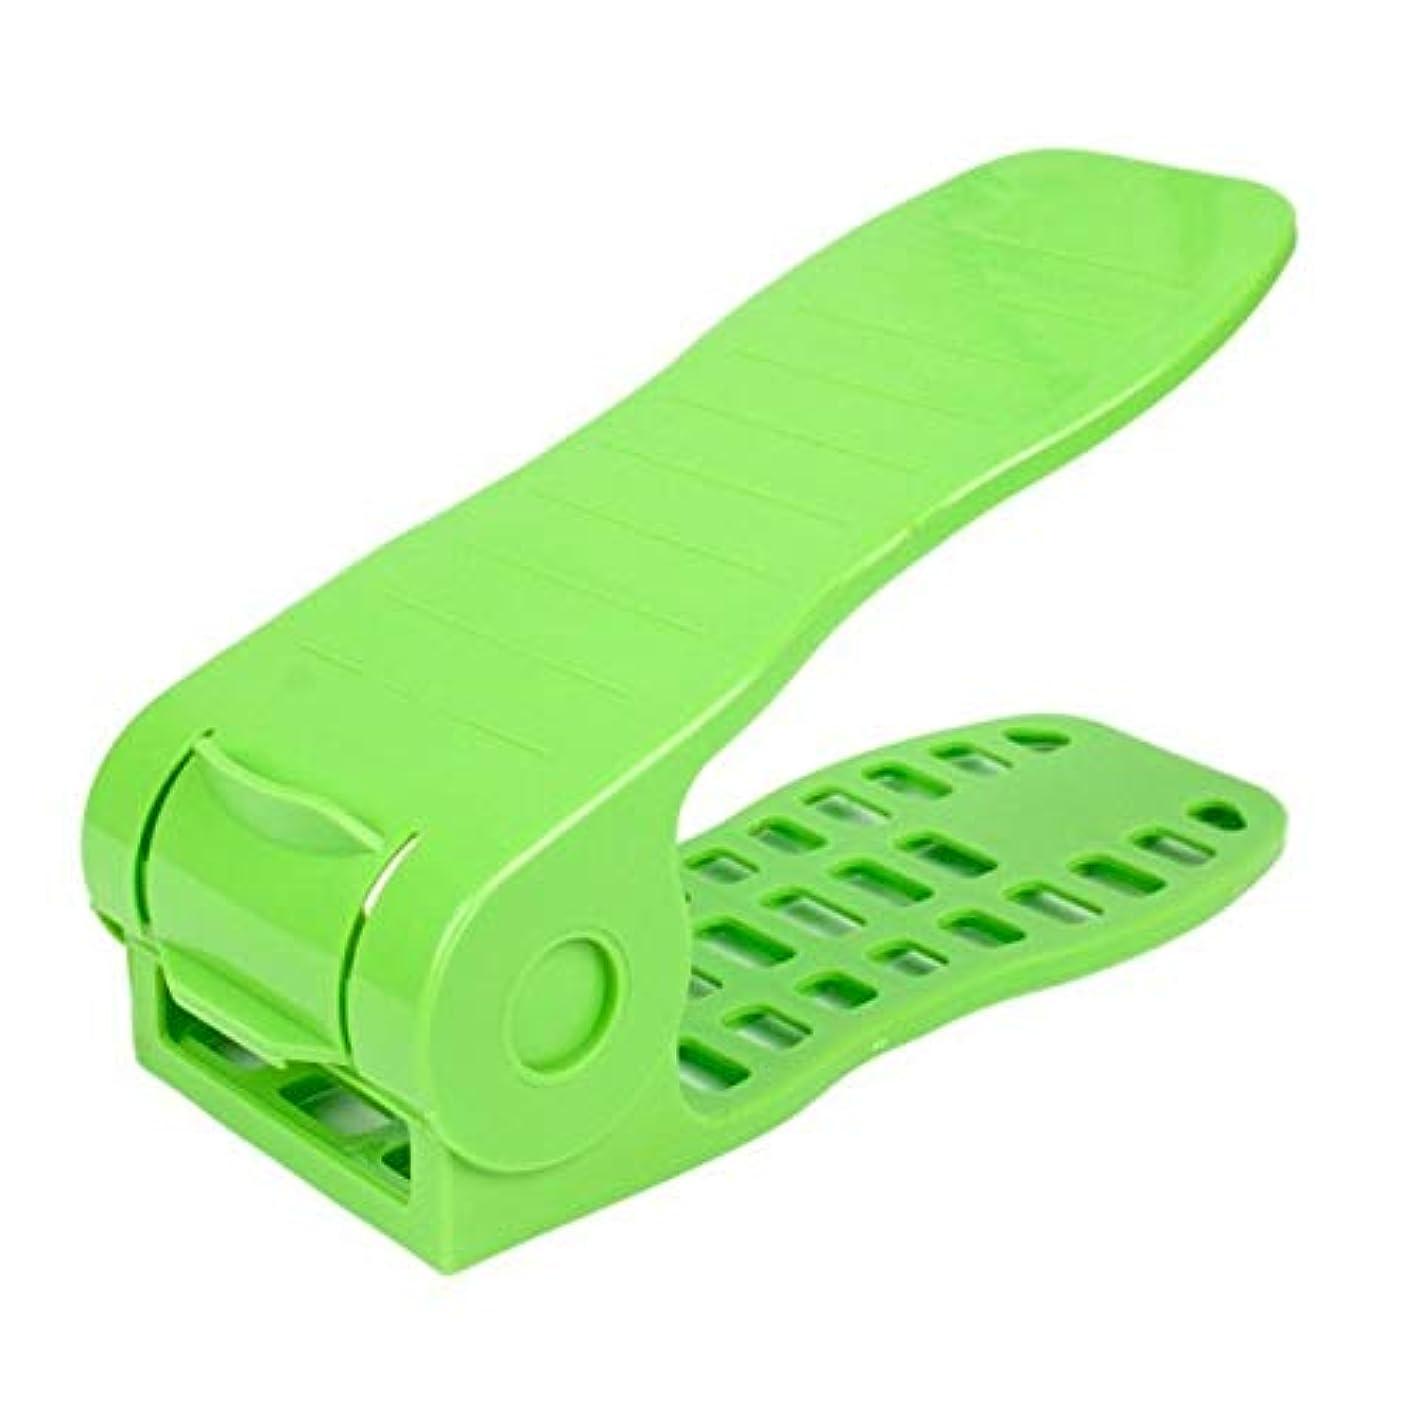 MOPOLIS 4 Level Adjustable Shoes Slots Organizer Dual-Layer Space Saver Shoe Rack Holder (Colors - Green)